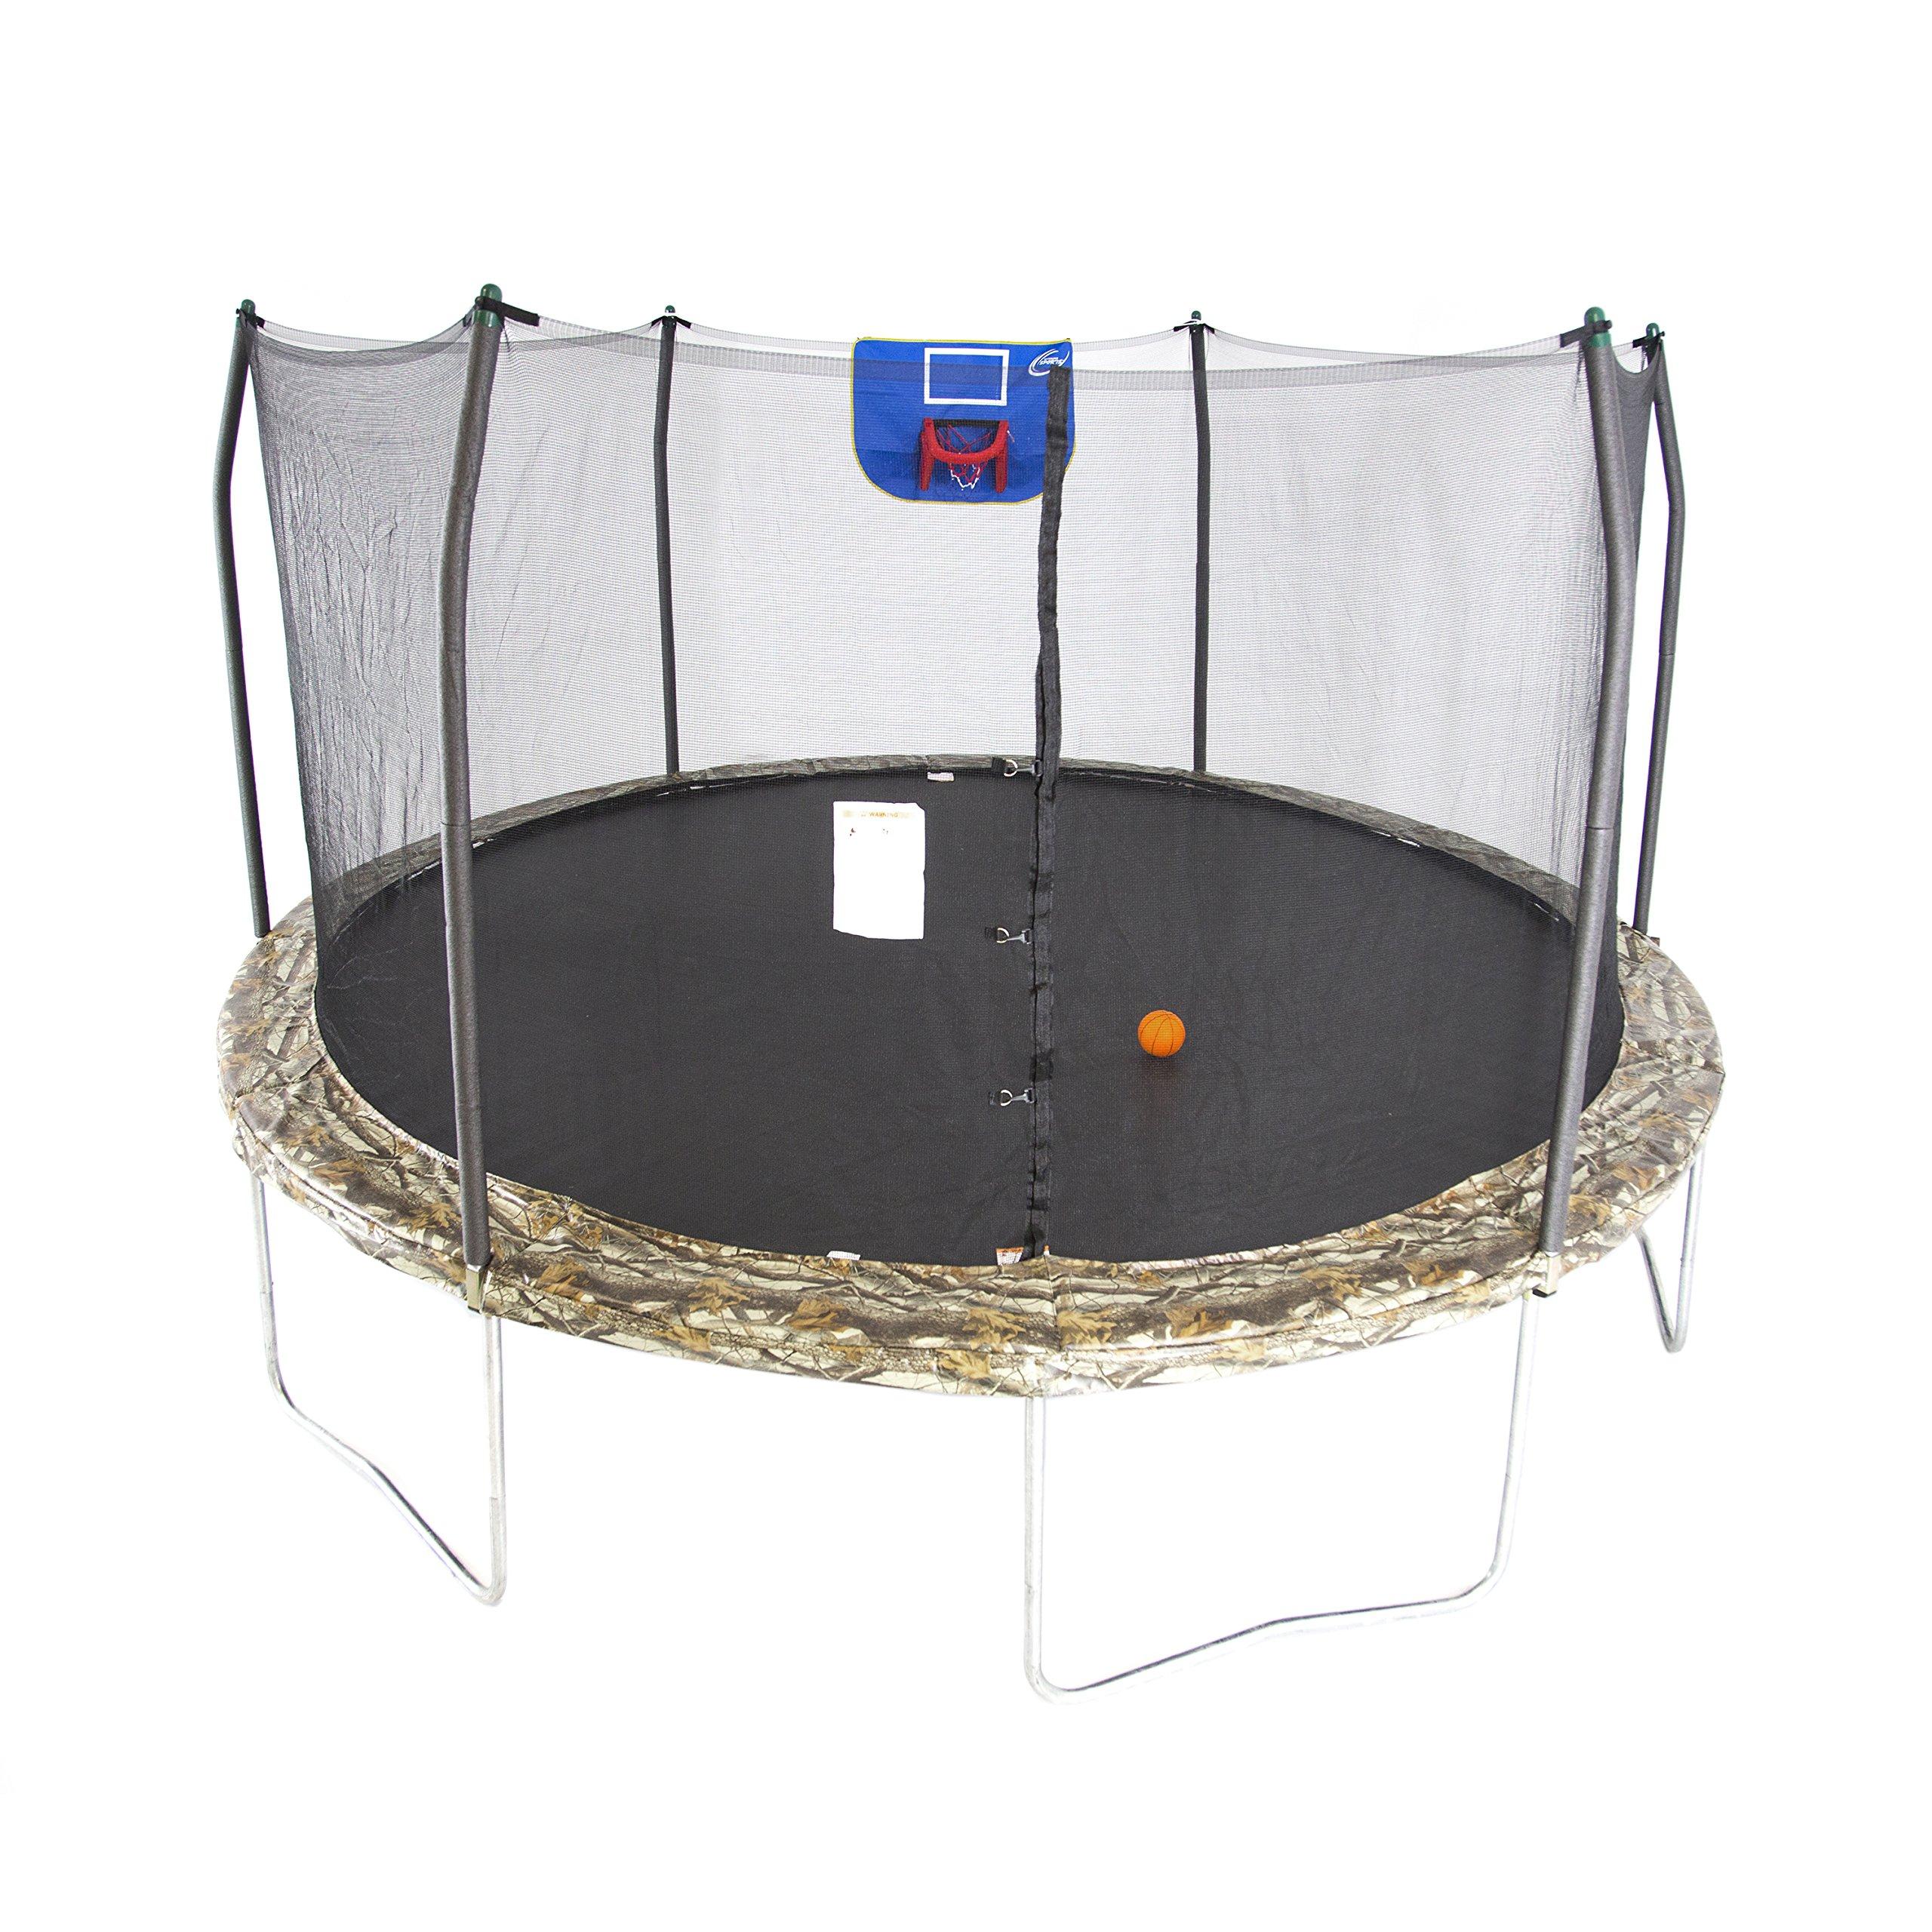 Skywalker Trampolines 15-Foot Jump N' Dunk Trampoline with Enclosure Net - Basketball Trampoline by Skywalker Trampolines